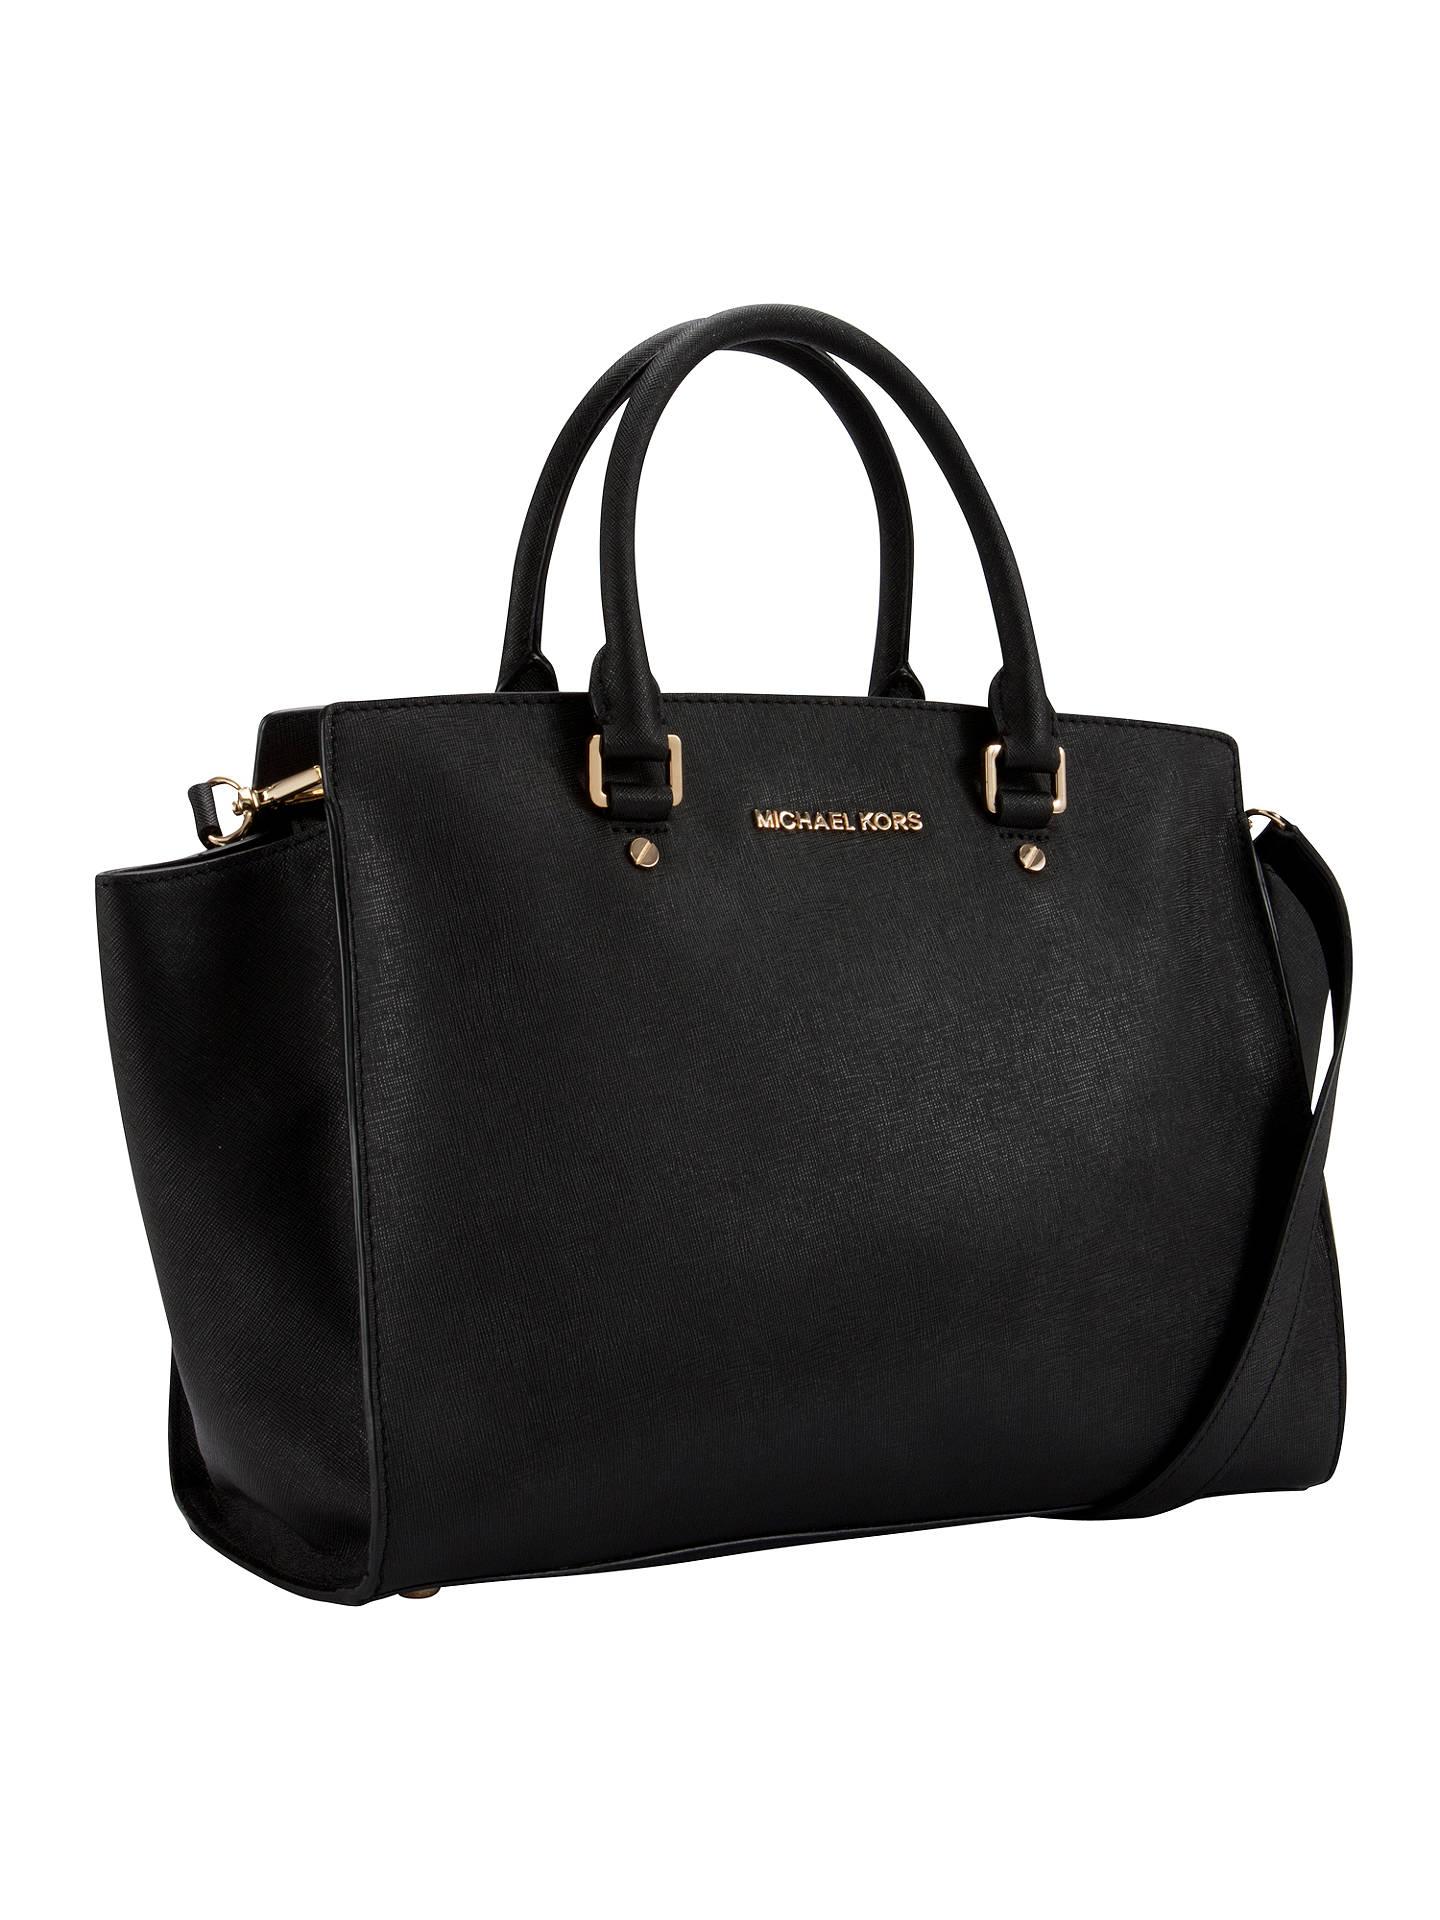 Michael Kors Selma Leather Satchel Bag